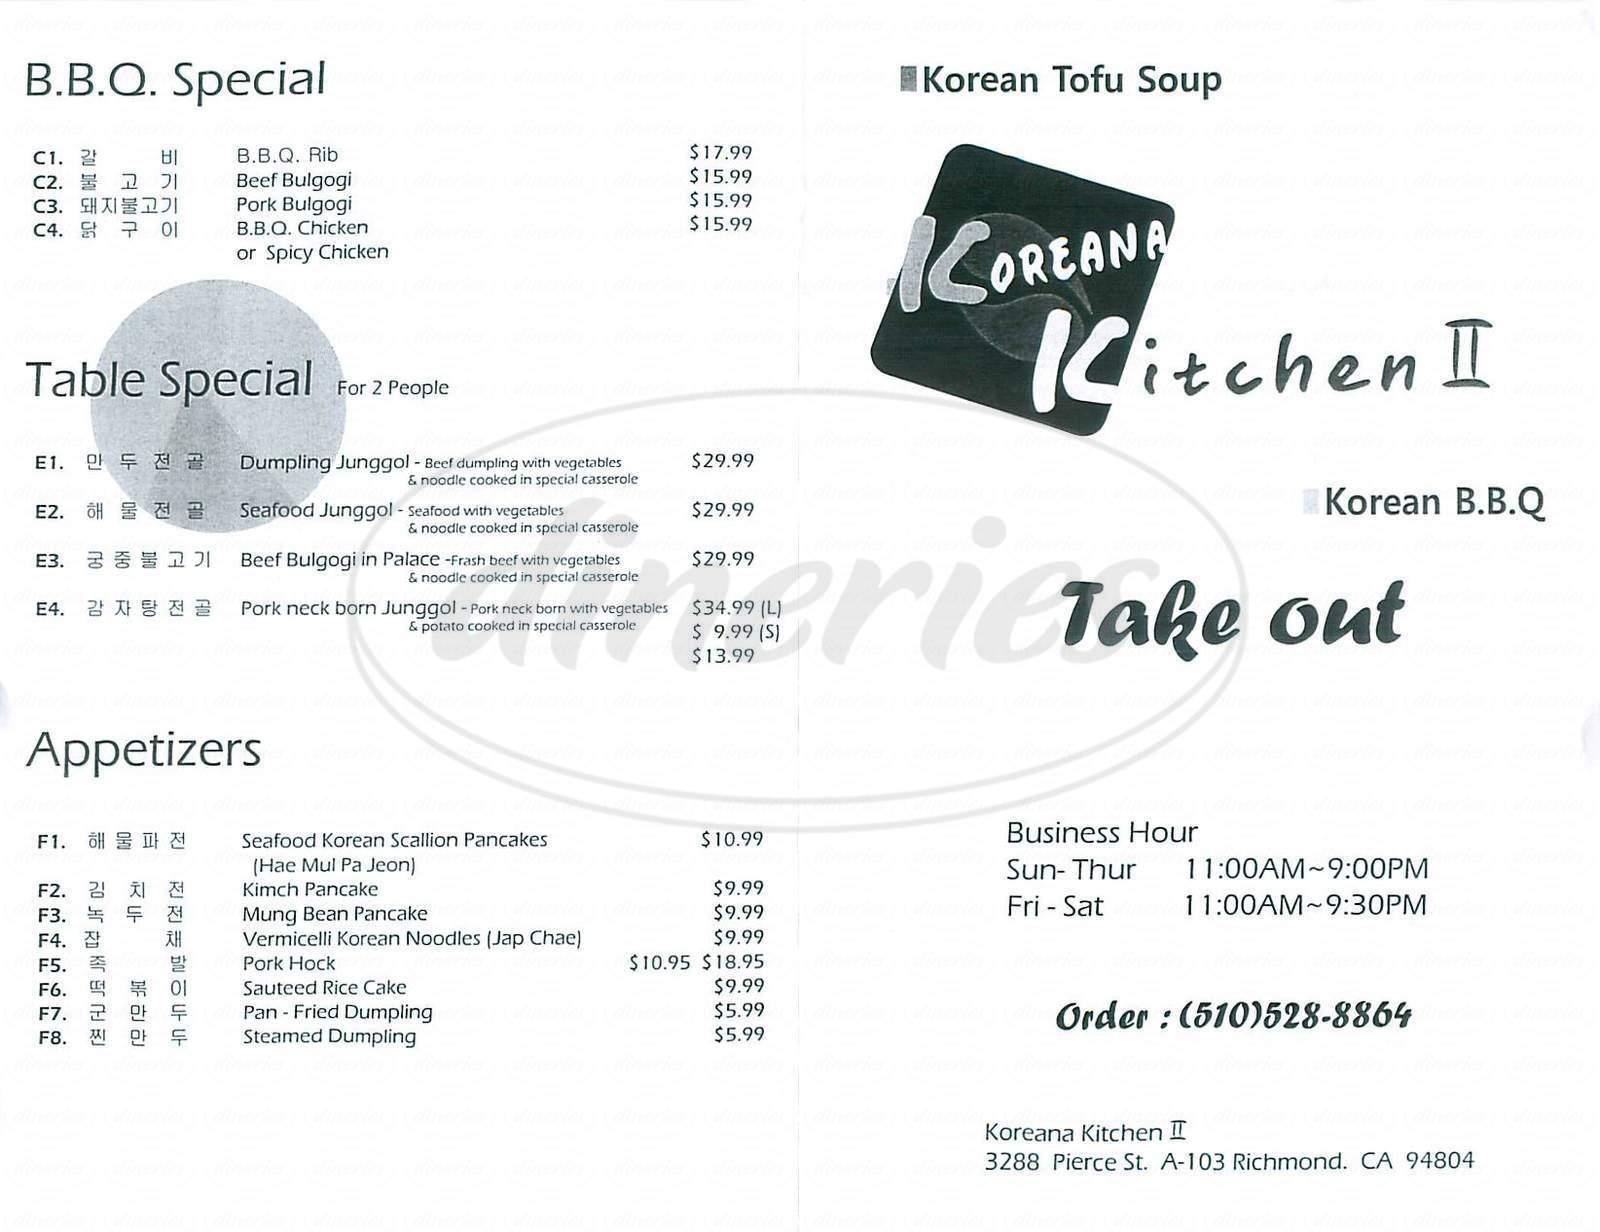 menu for Koreana Kitchen II